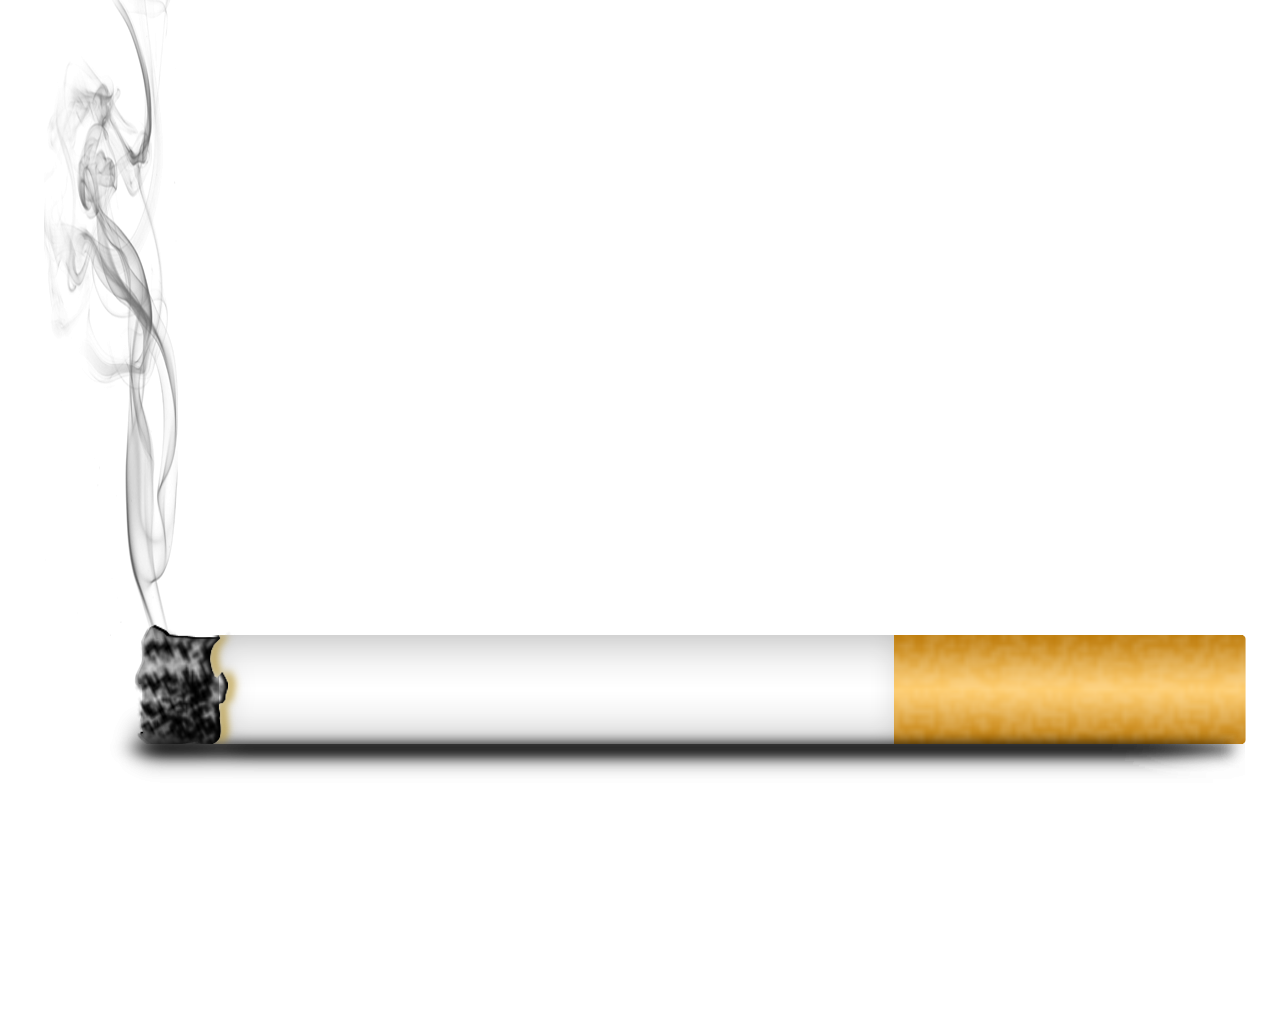 Cigarette PNG Image - PurePNG | Free transparent CC0 PNG ...